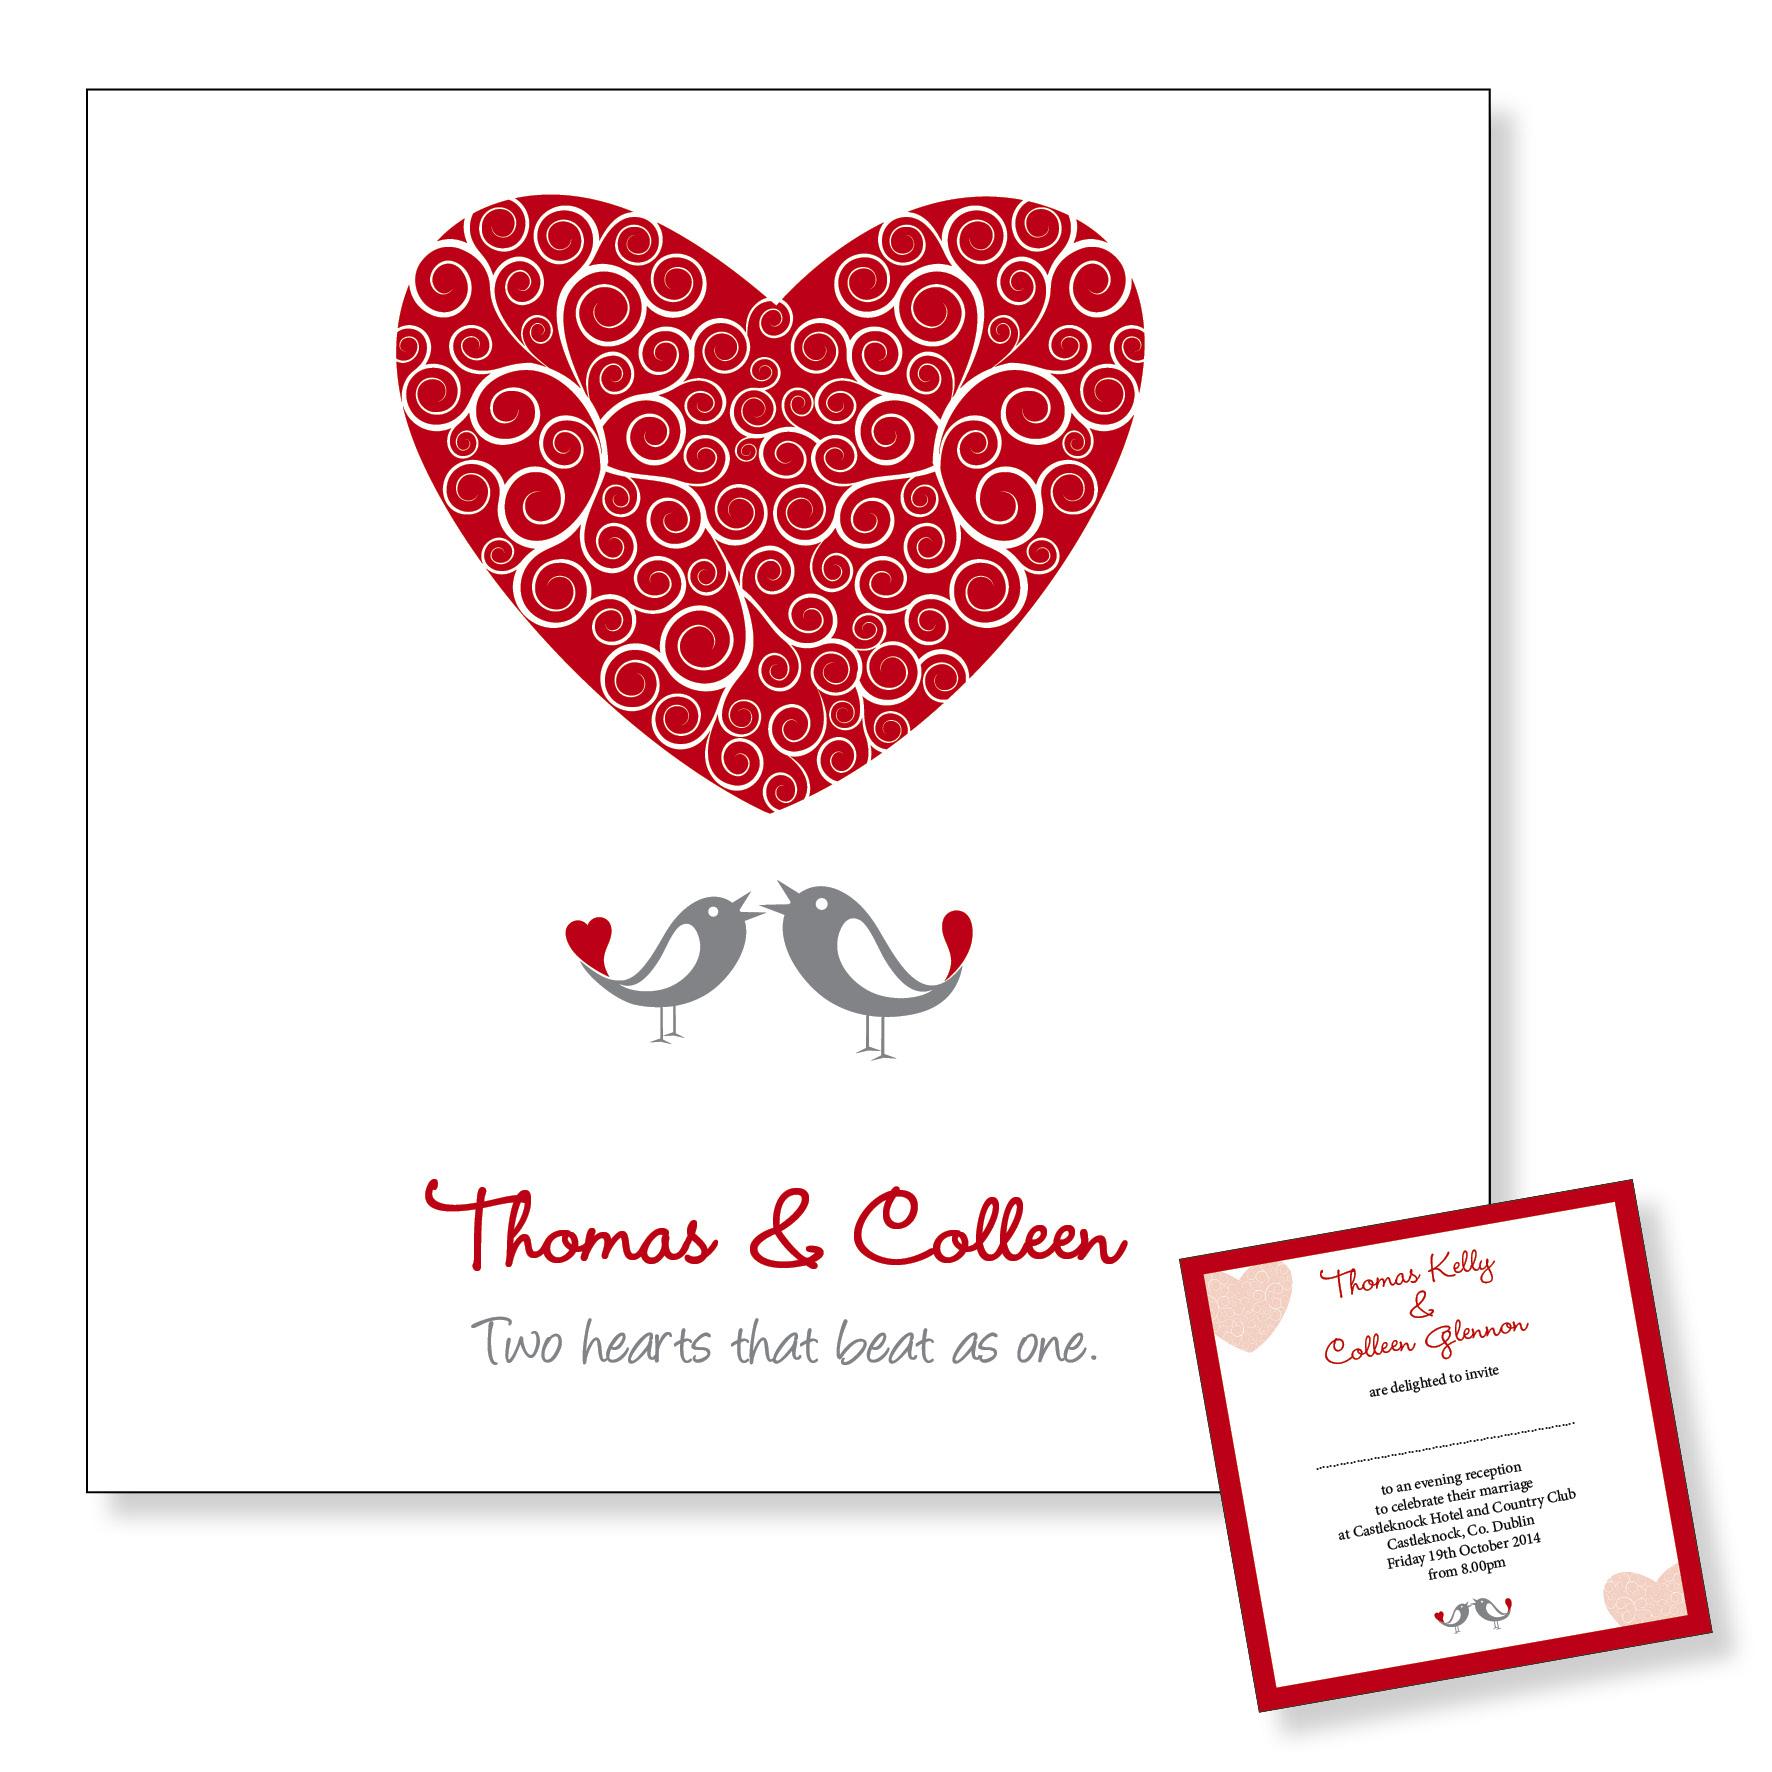 Evening wedding invitation with love birds